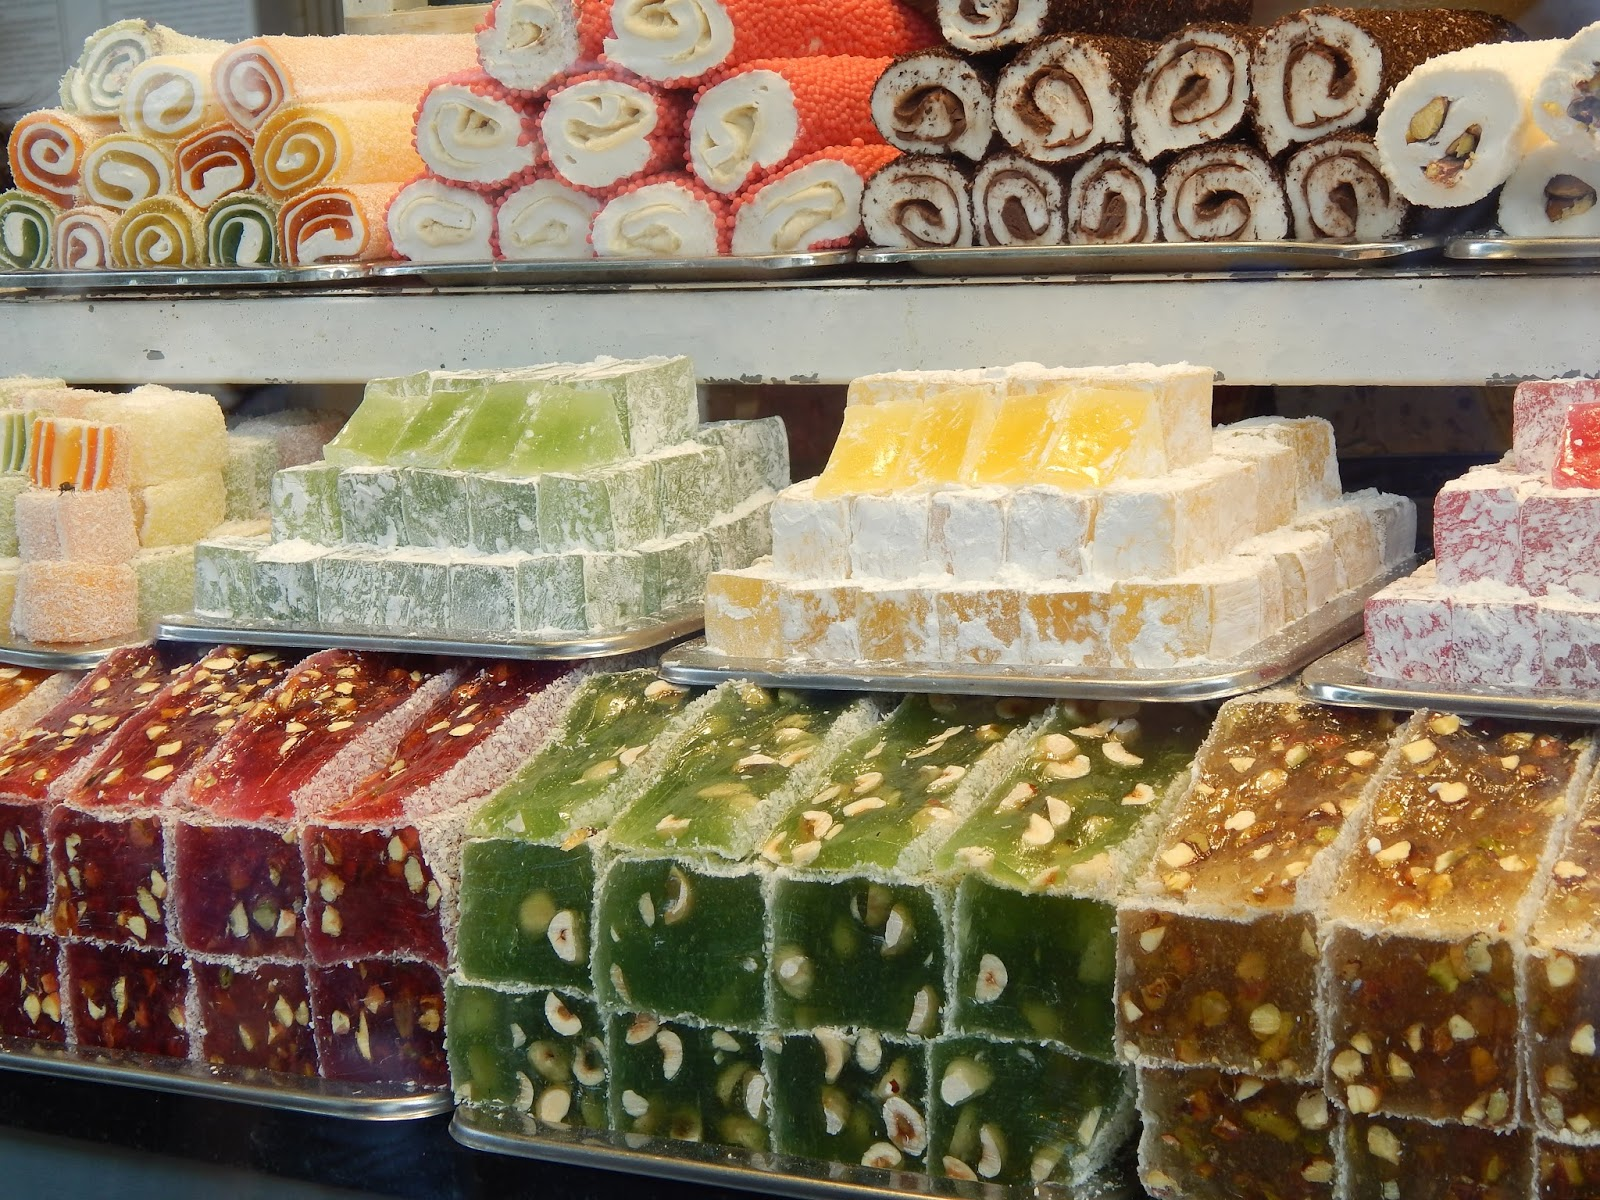 Turecké sladkosti